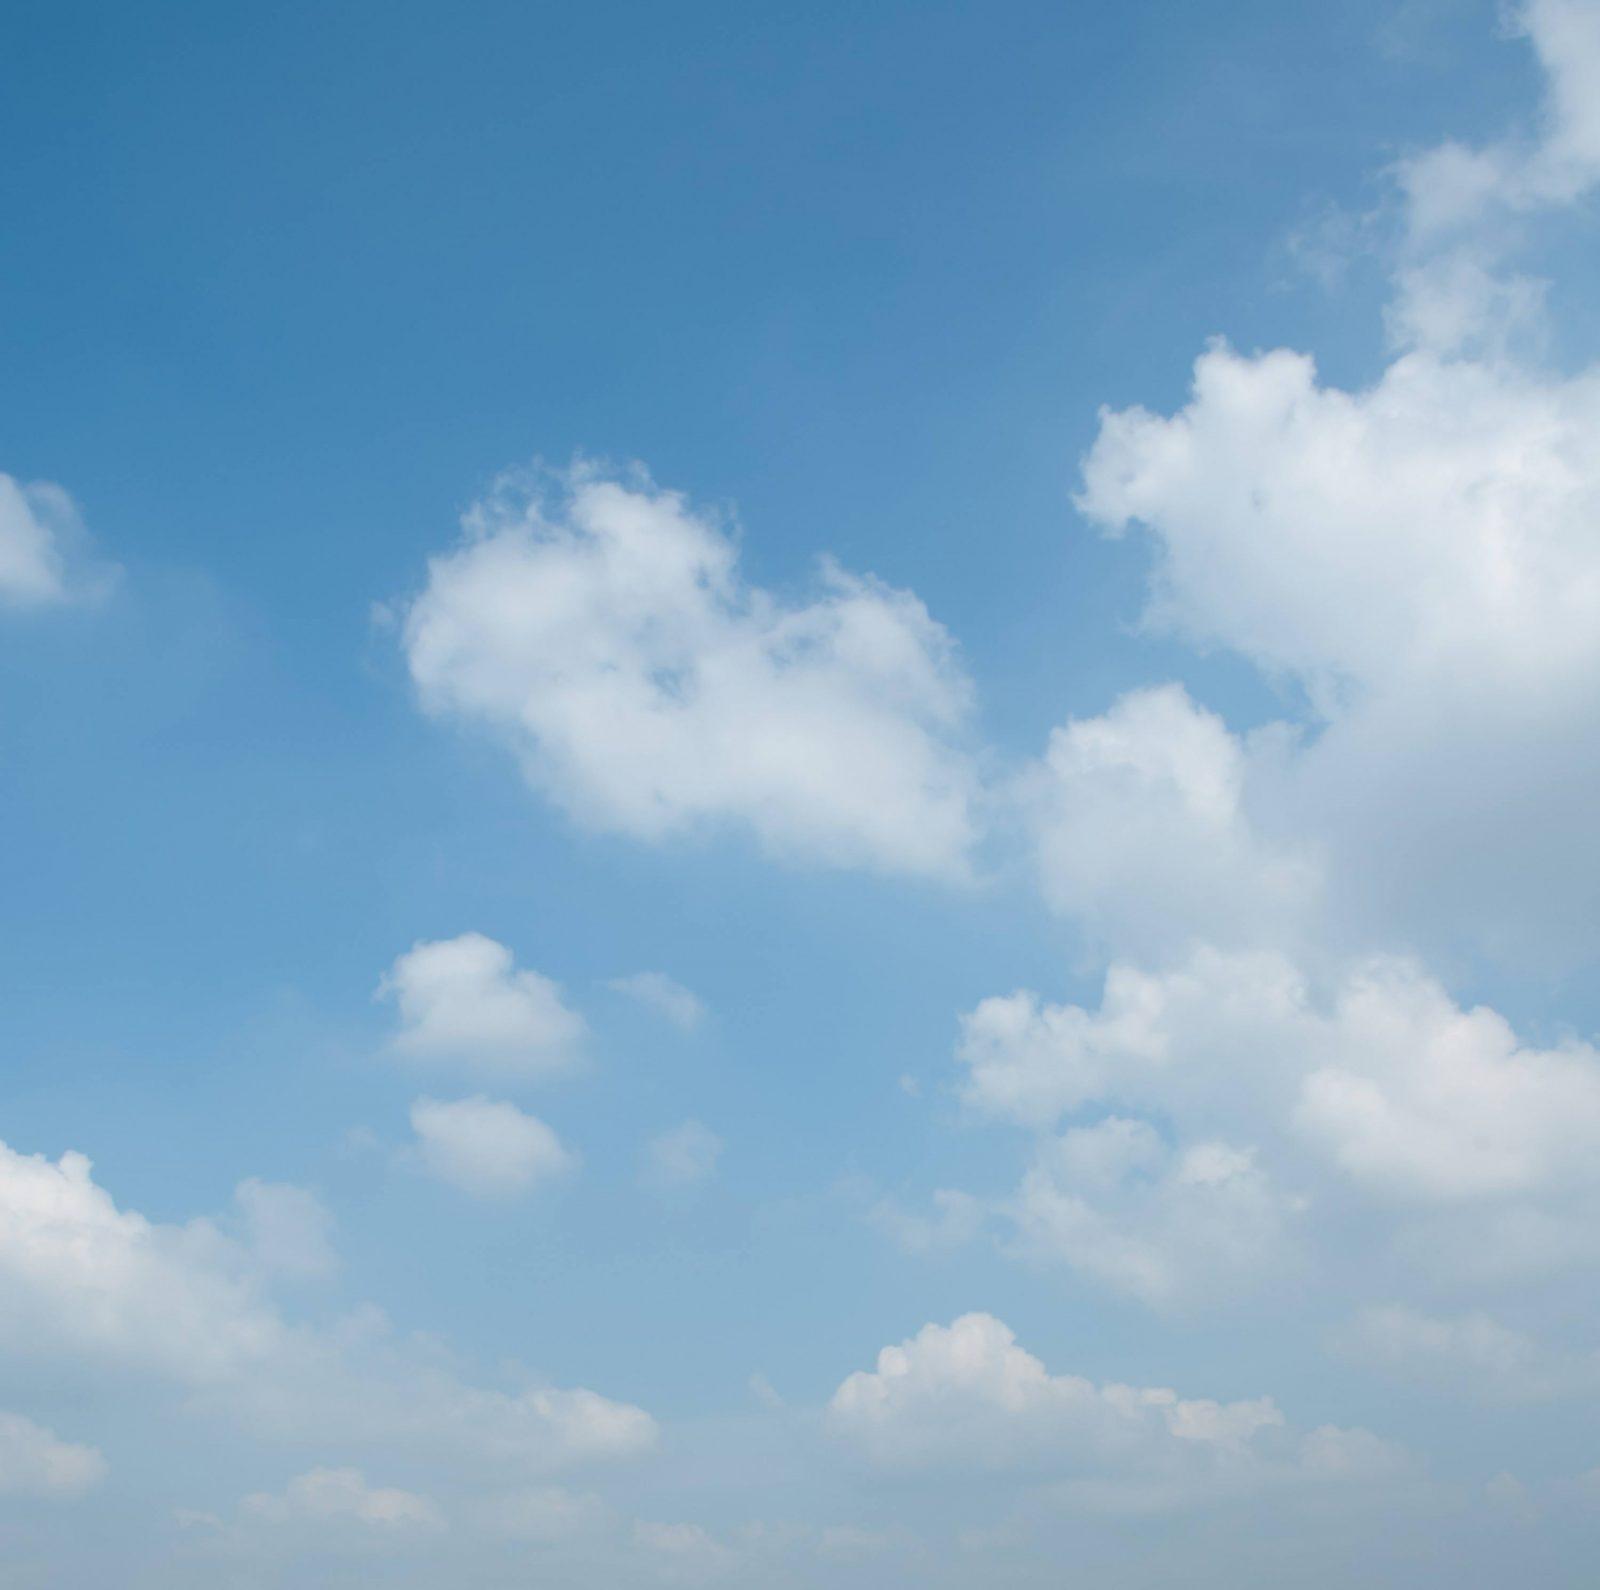 Soft White Clouds on a Light Blue Sky